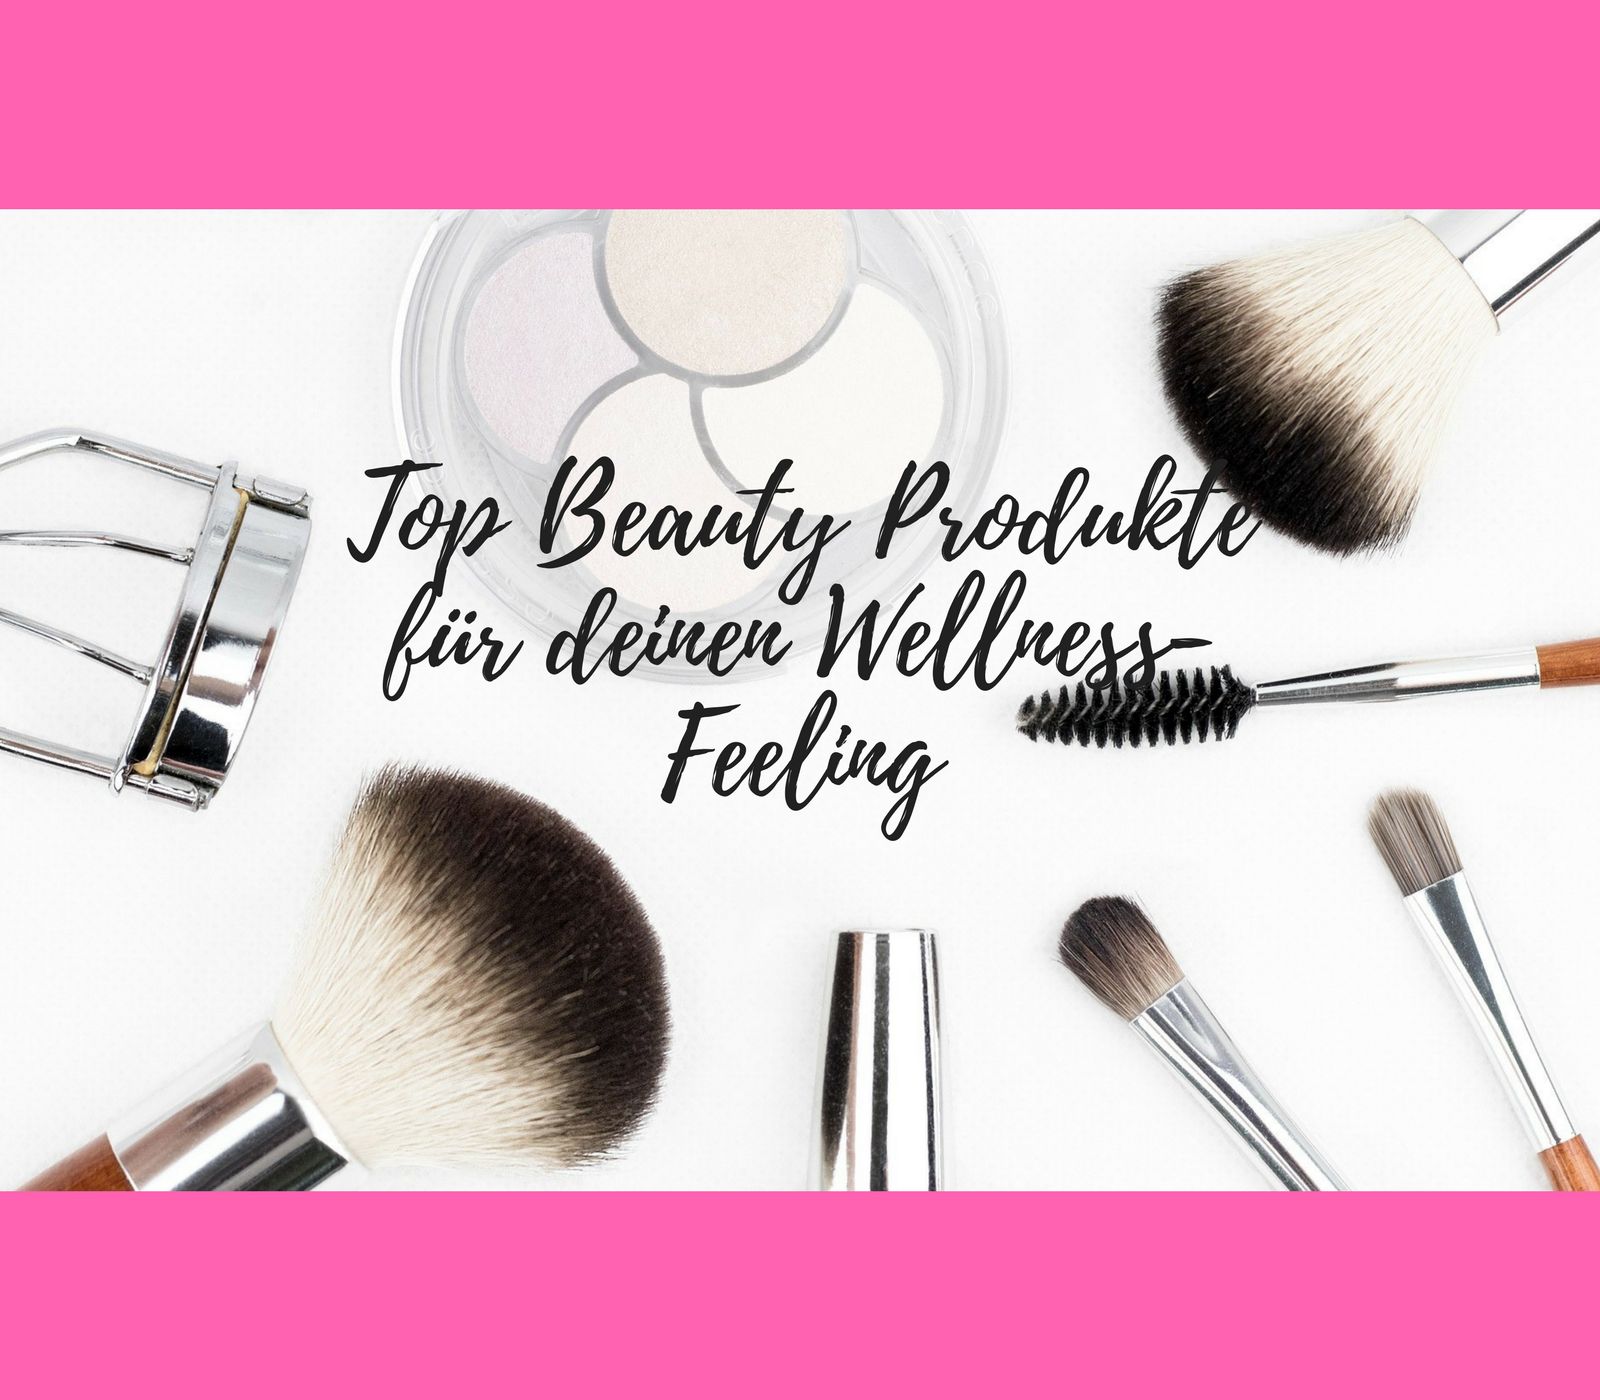 Top Beauty Produkte für dein Wellness Feeling Haare und Beauty Haare ...